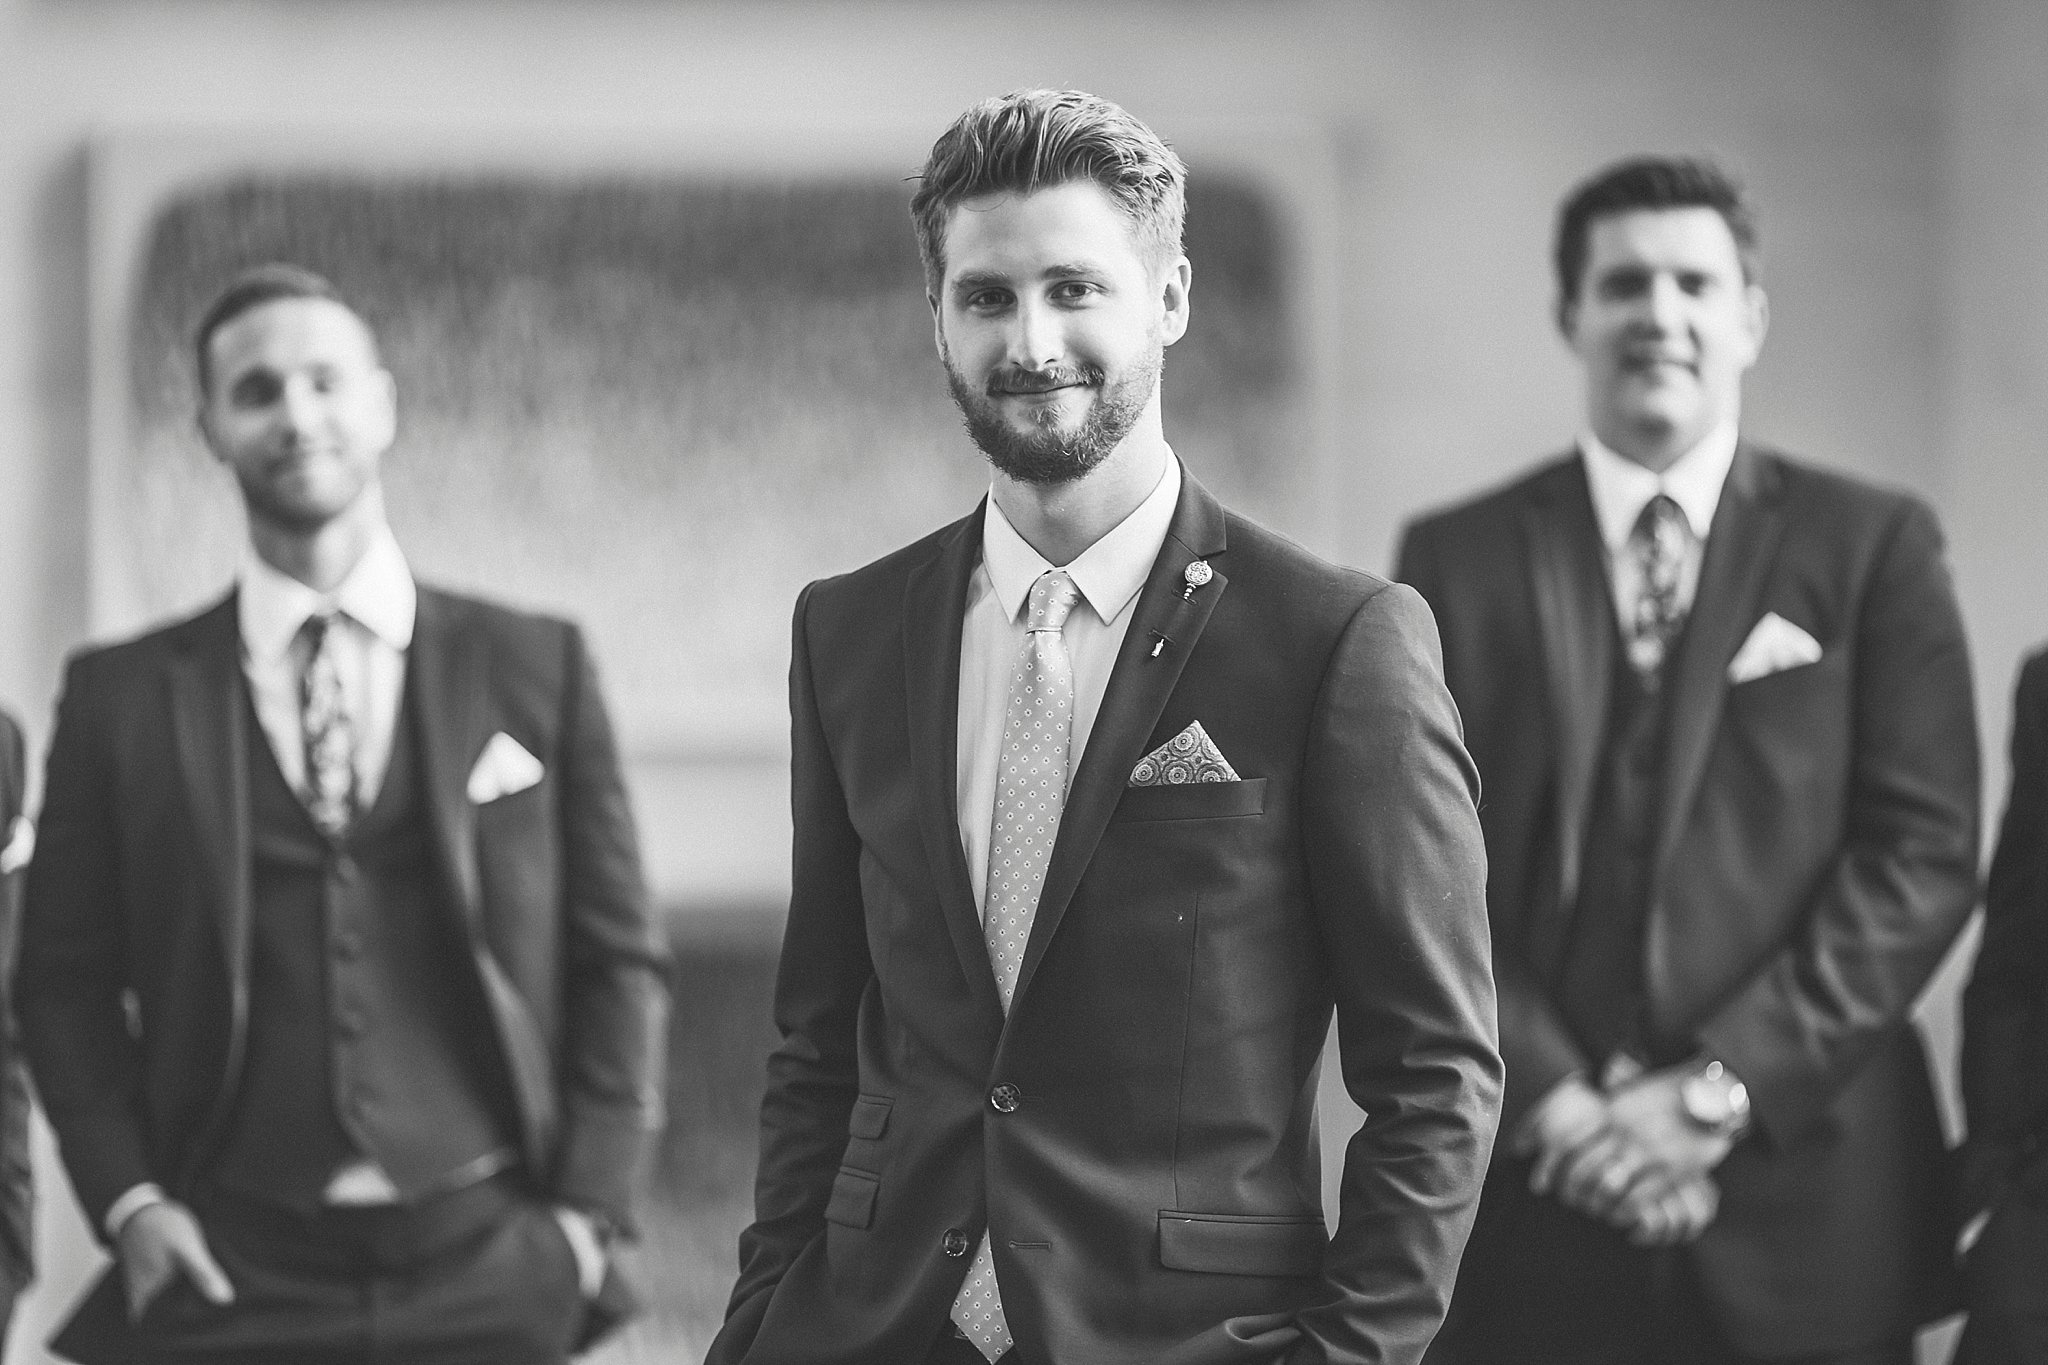 Groom at a St. John's, Newfoundland Wedding